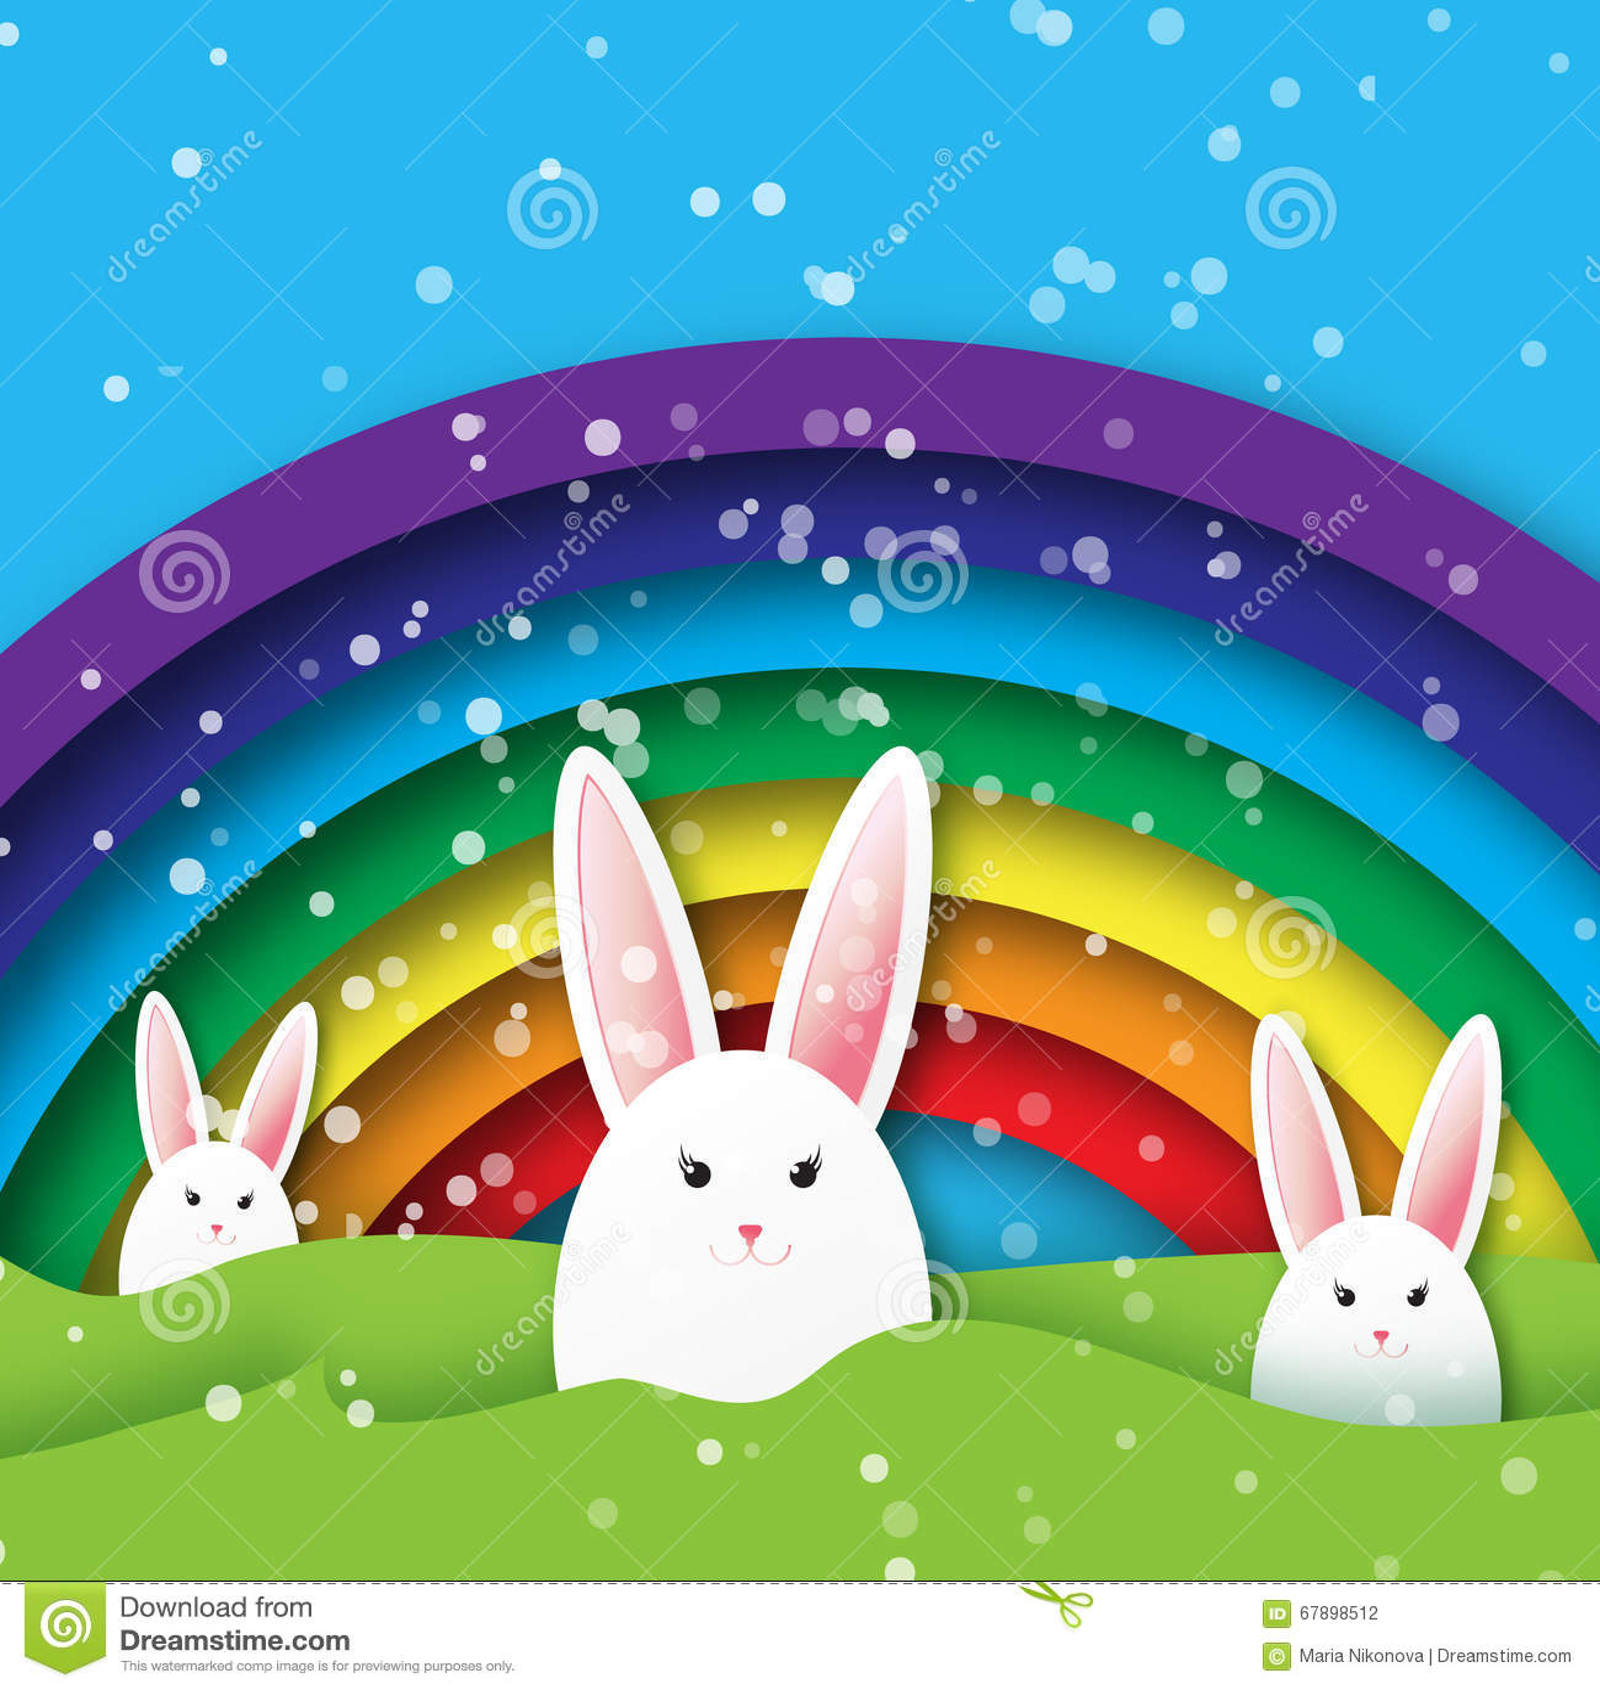 Easter Bunny Rainbow | Fcbarcelonarealmadrid - photo#39